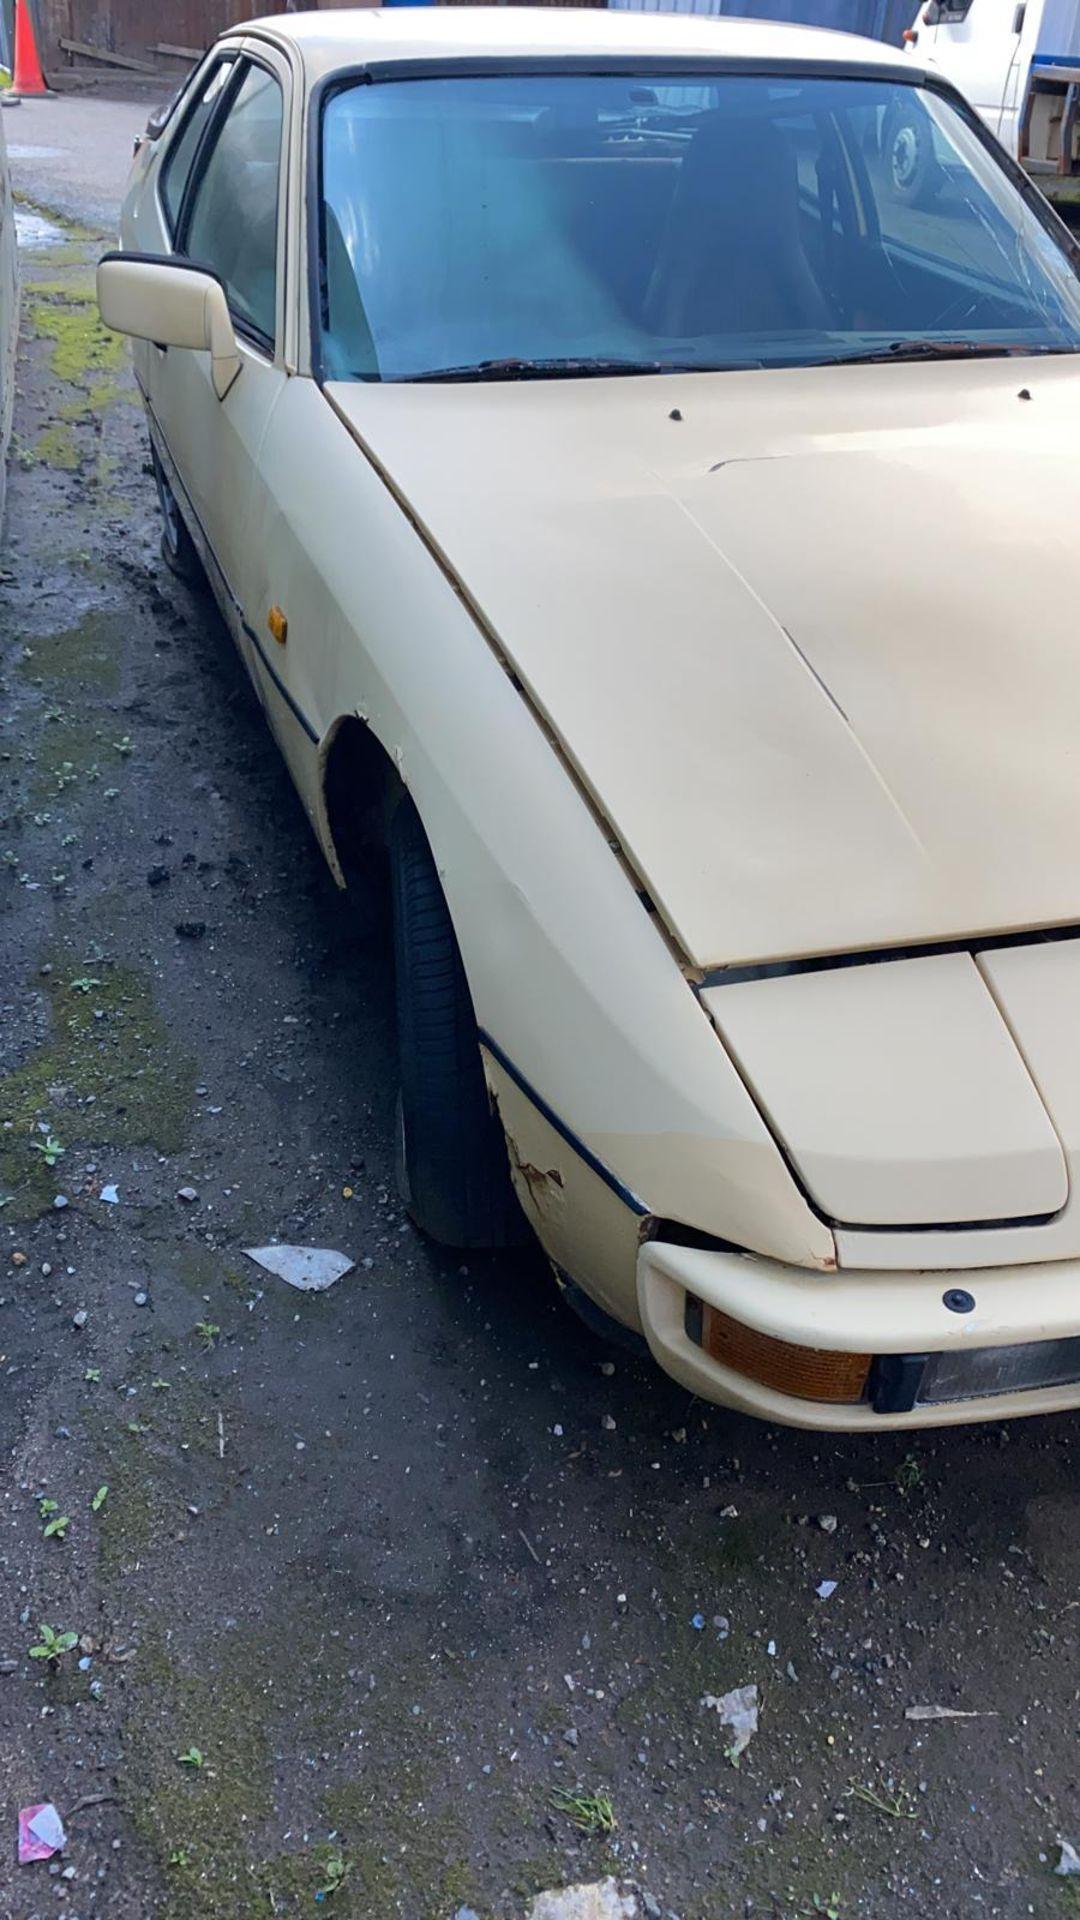 1983/A REG PORSCHE 924 2.0 PETROL BEIGE COUPE, V5 PRESENT *NO VAT* - Image 4 of 12